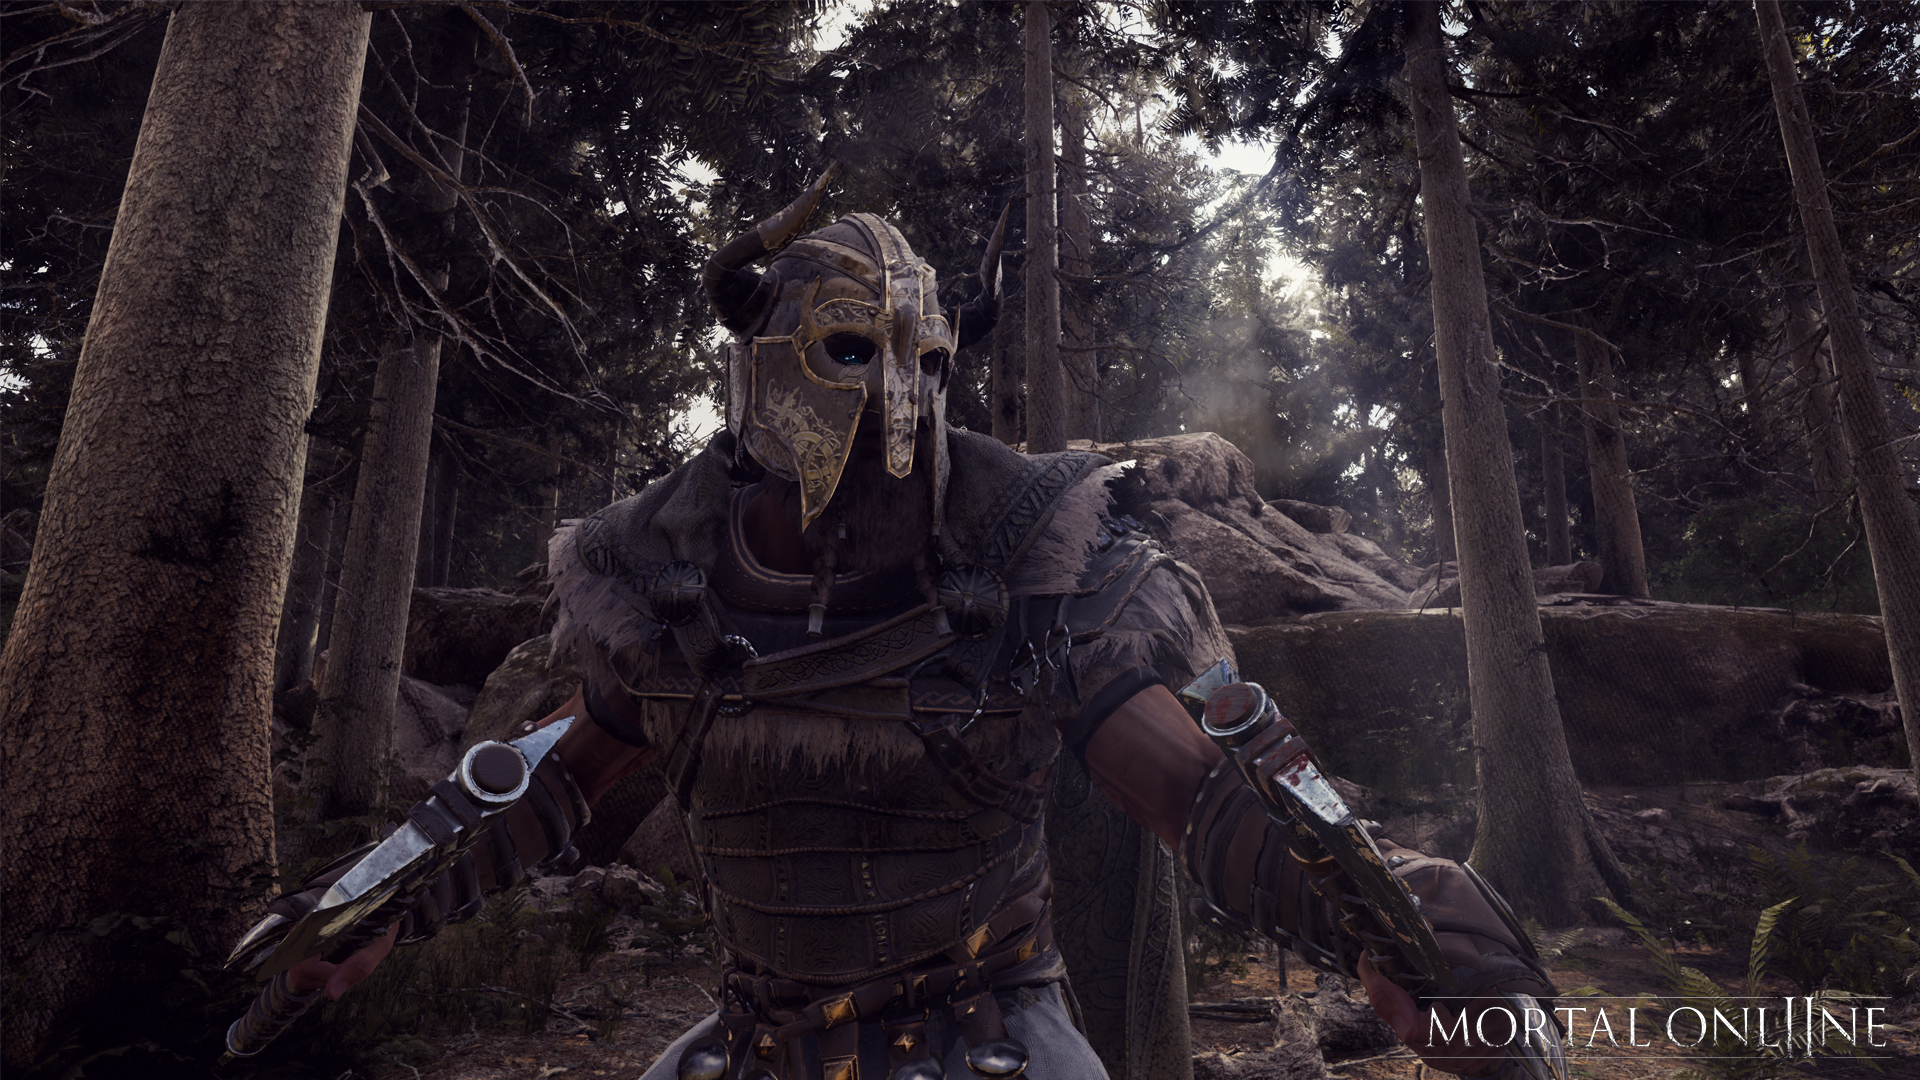 Mortal Online 2 screenshot